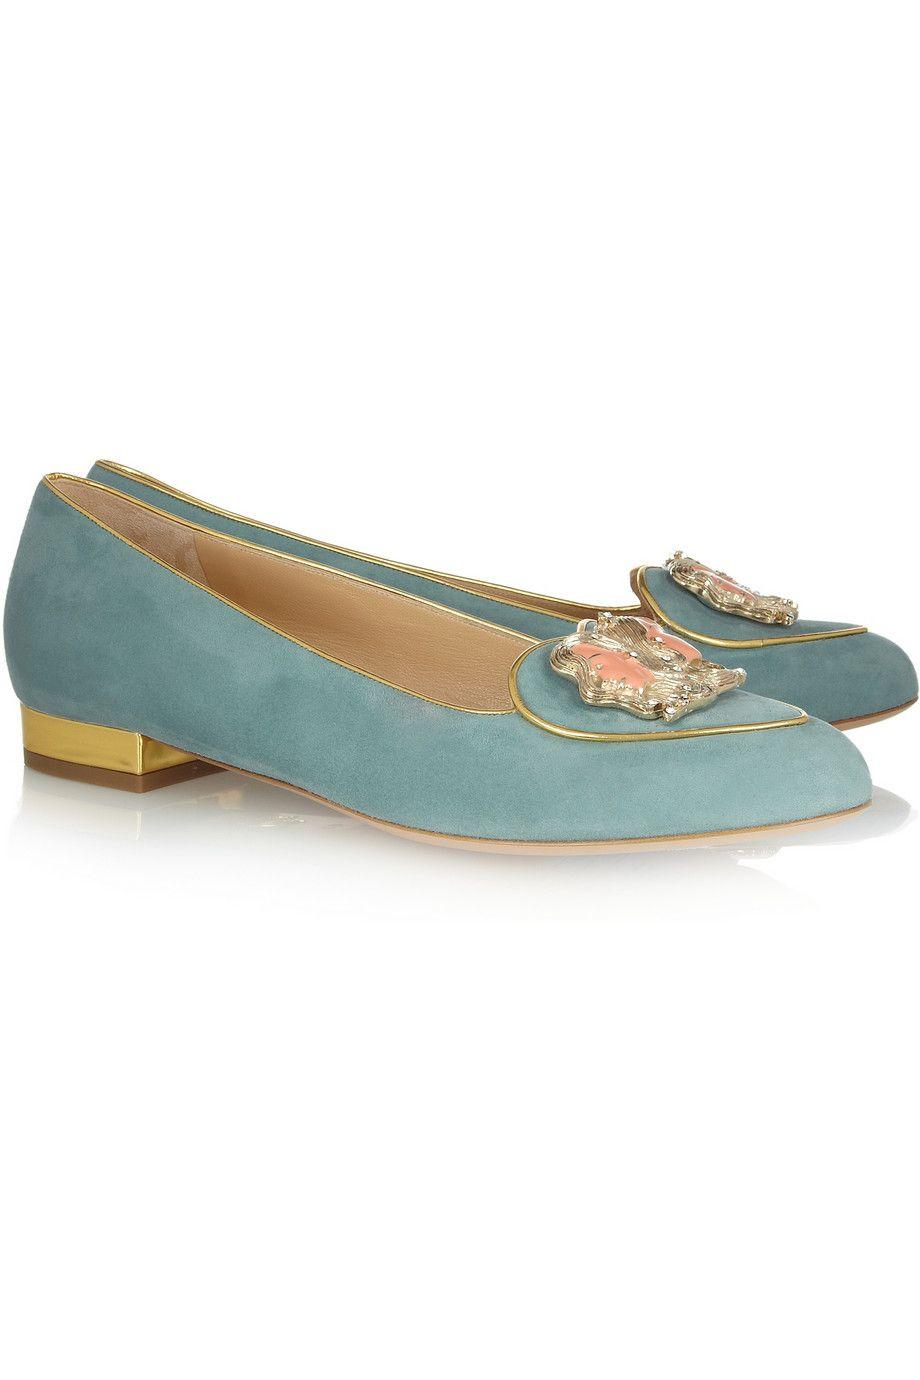 Charlotte Olympia|Gemini suede slippers|NET-A-PORTER.COM